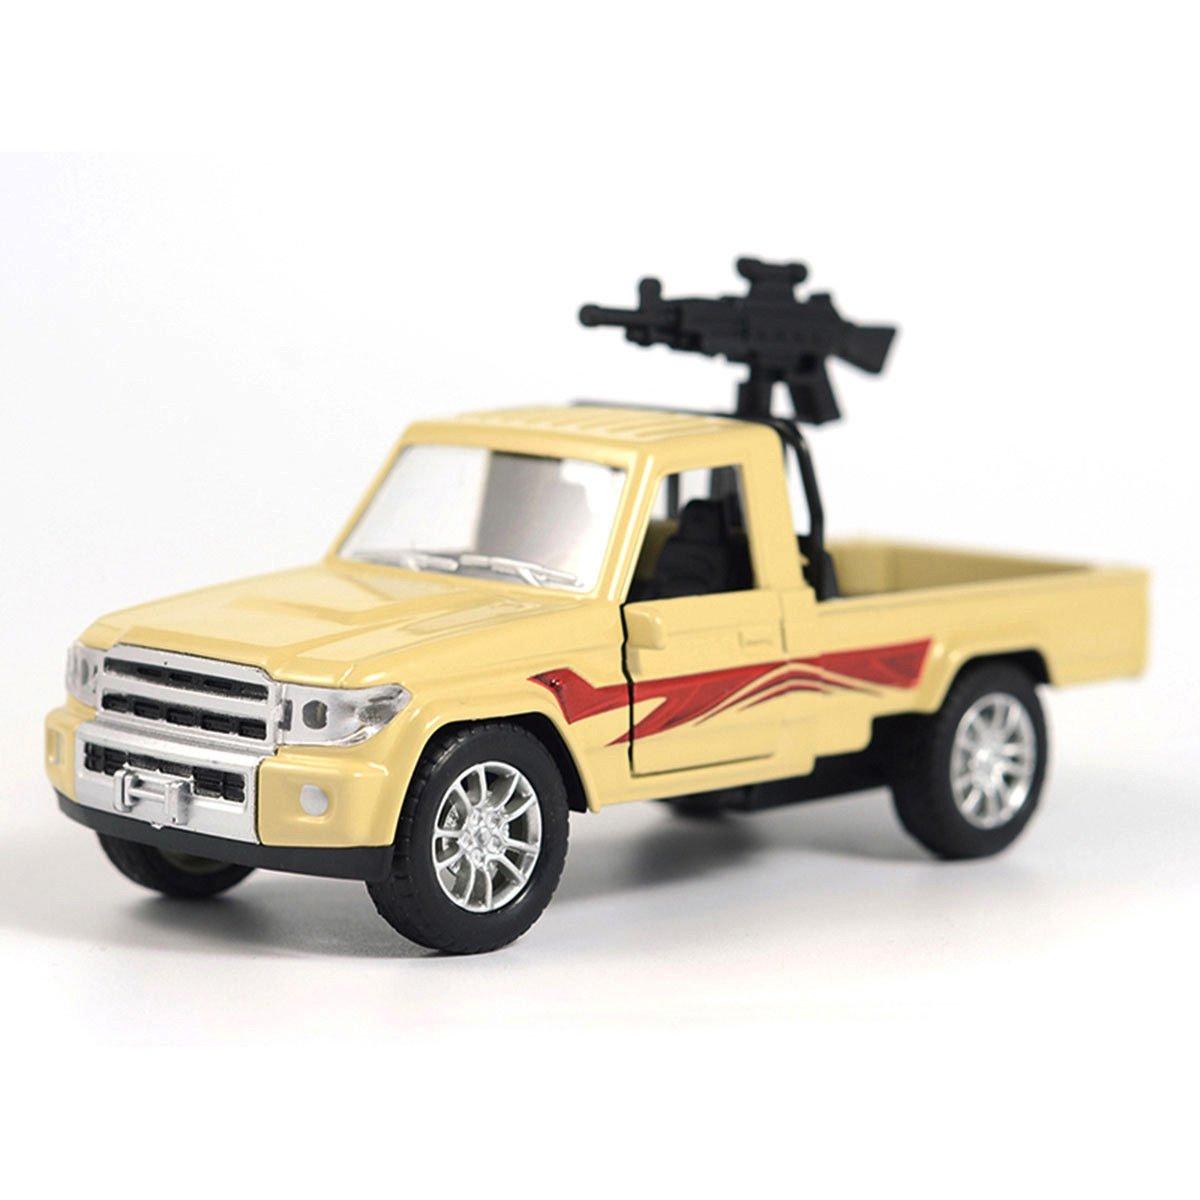 1:28 Military Pickup Truck w/ Machine Gun Force Car Model Alloy Diecast Vehicle